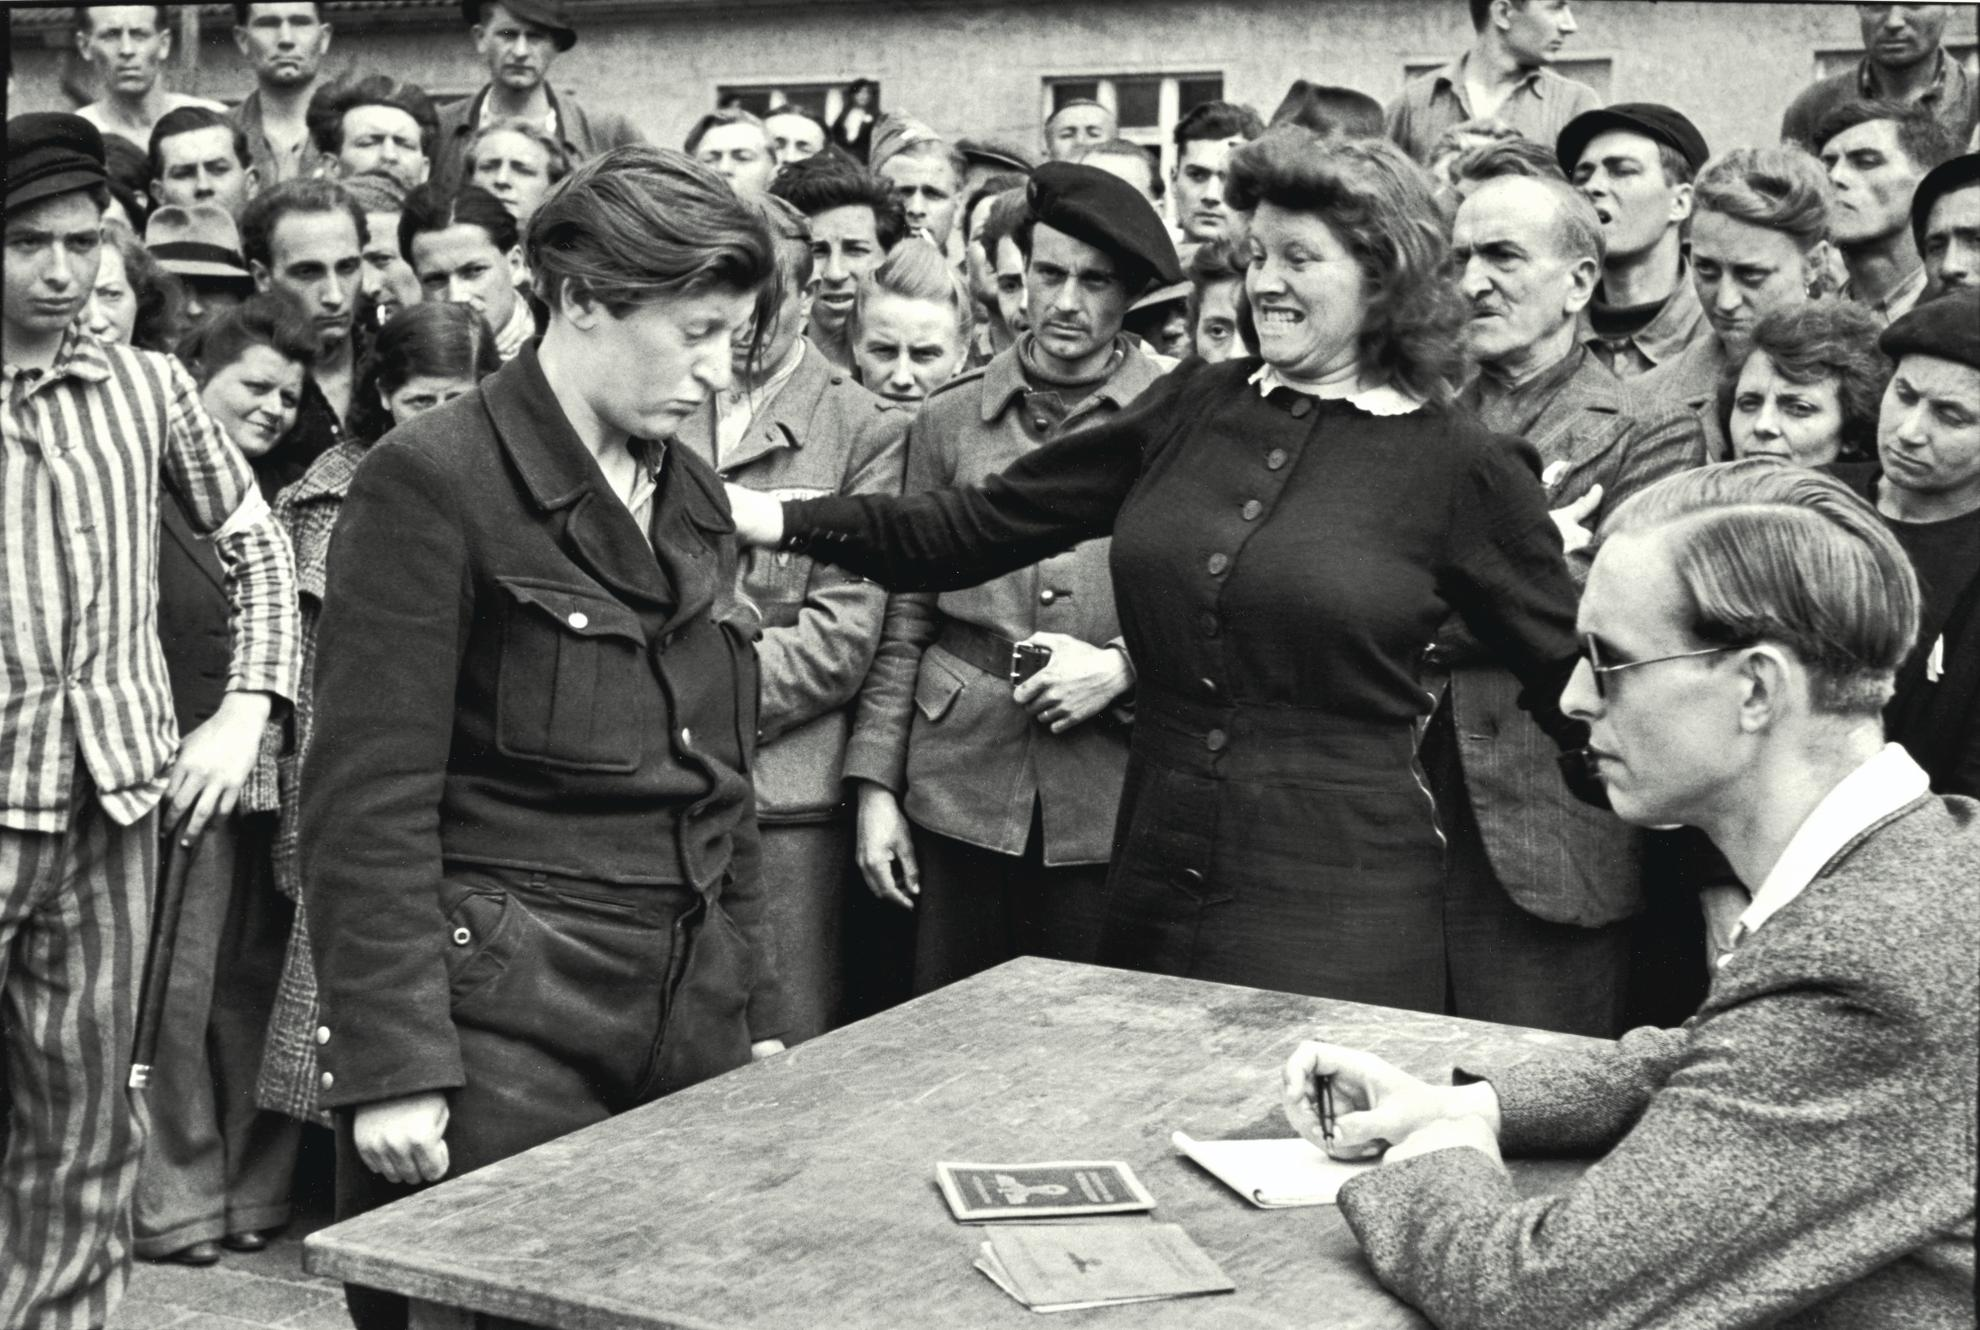 Henri Cartier-Bresson-Dessau, April-1945